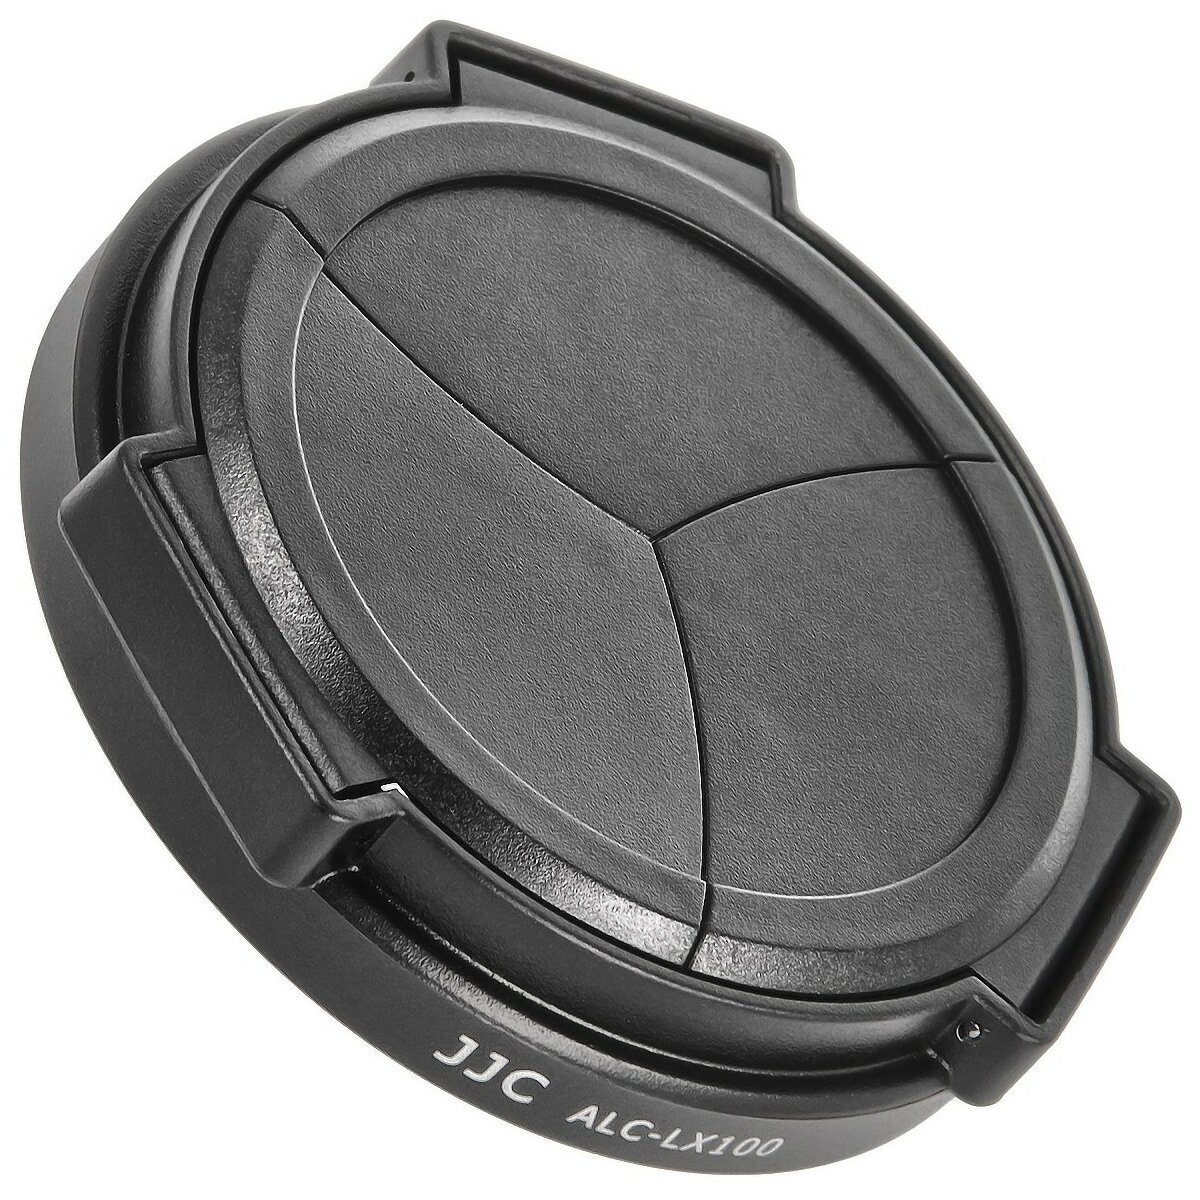 JJC Automatic Lens Cap, Front Cover for Panasonic LUMIX DMC-LX100 - ALC-LX100 Black